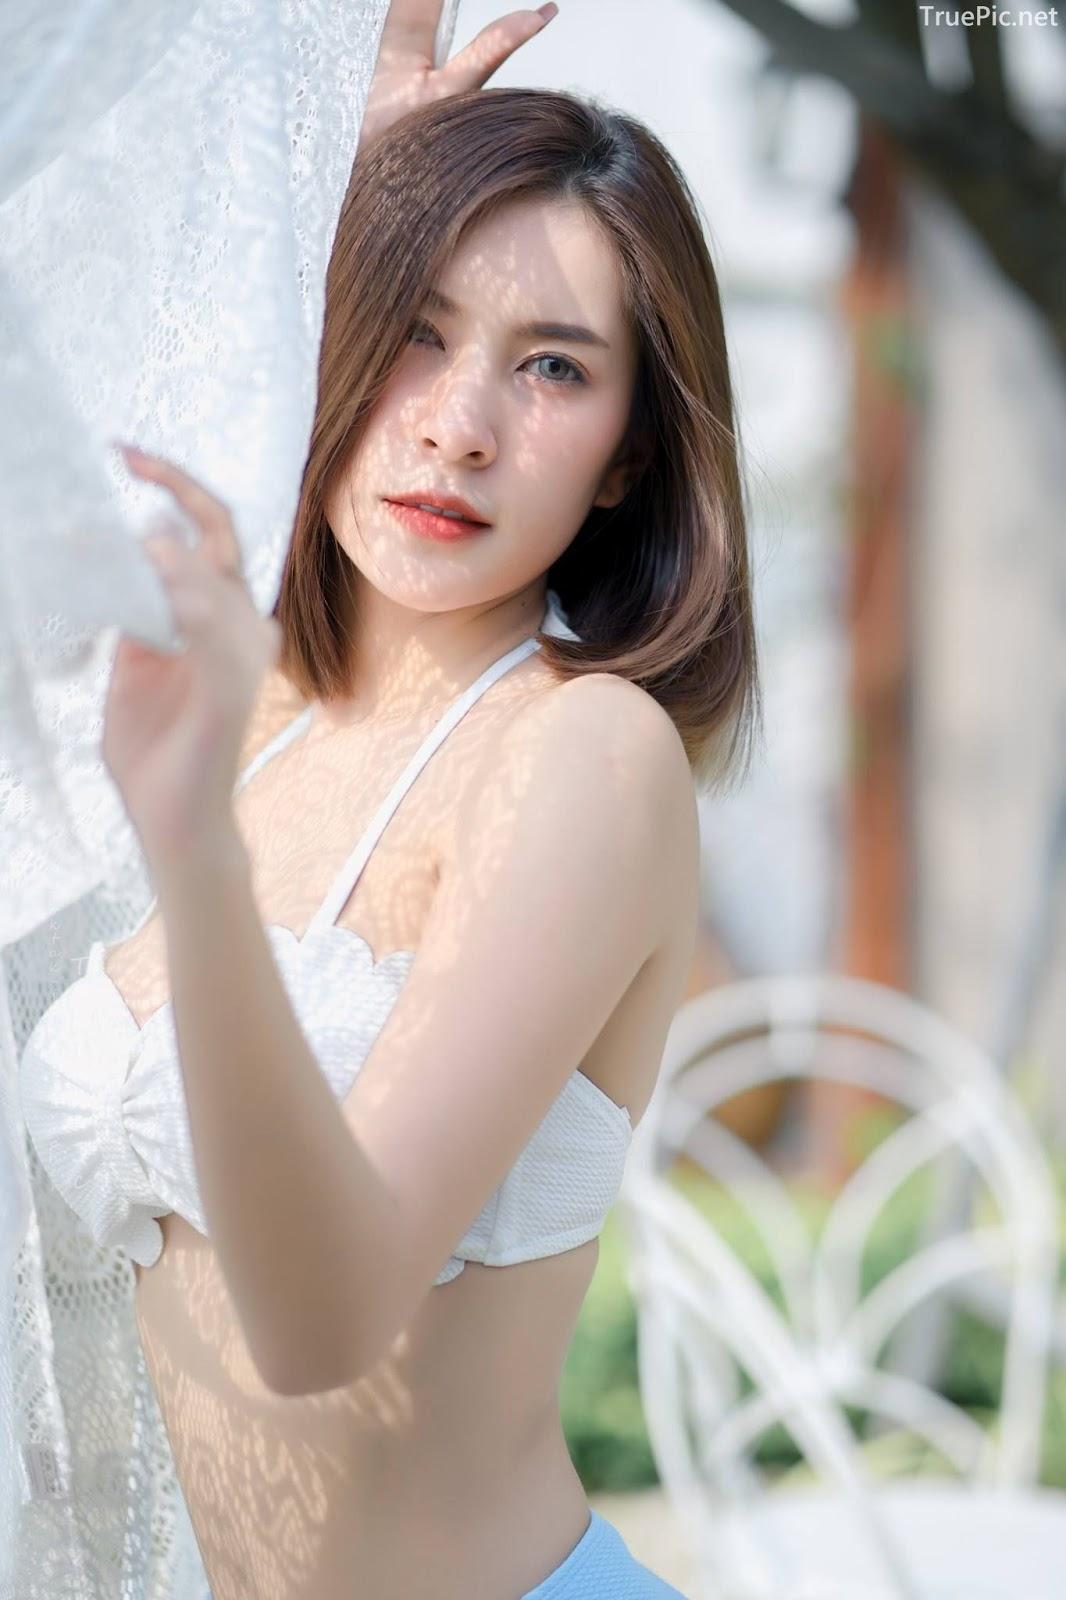 Thailand hot model MIldd Thanyarath Sriudomloert - Sexy 2 Piece Swimsuits - Picture 5